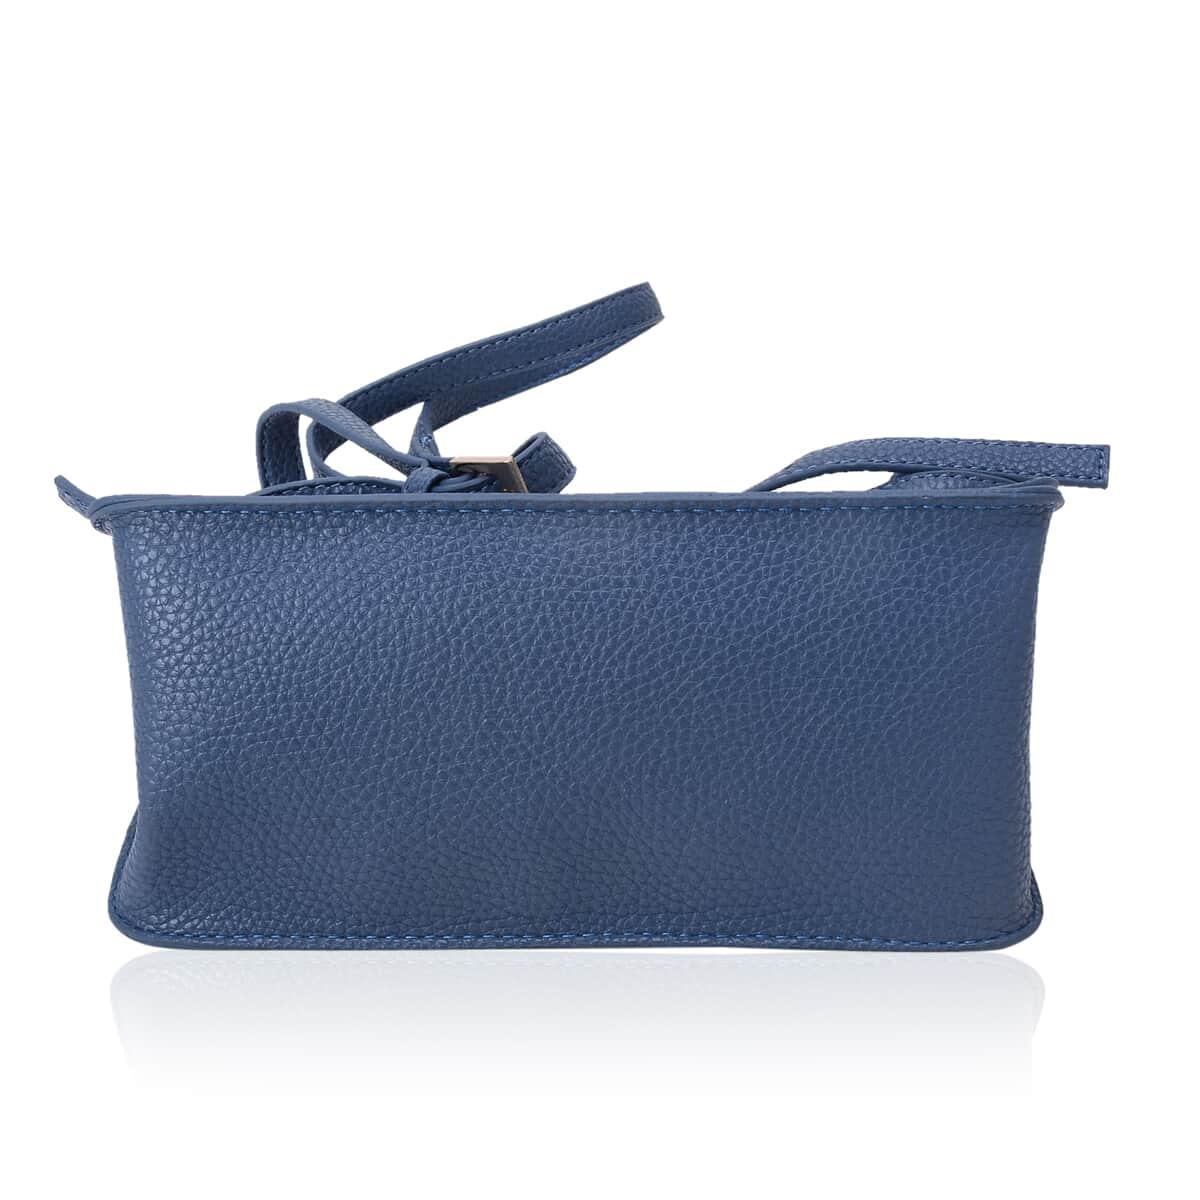 Blue Faux Leather Crossbody Bag (8x4x7 in)